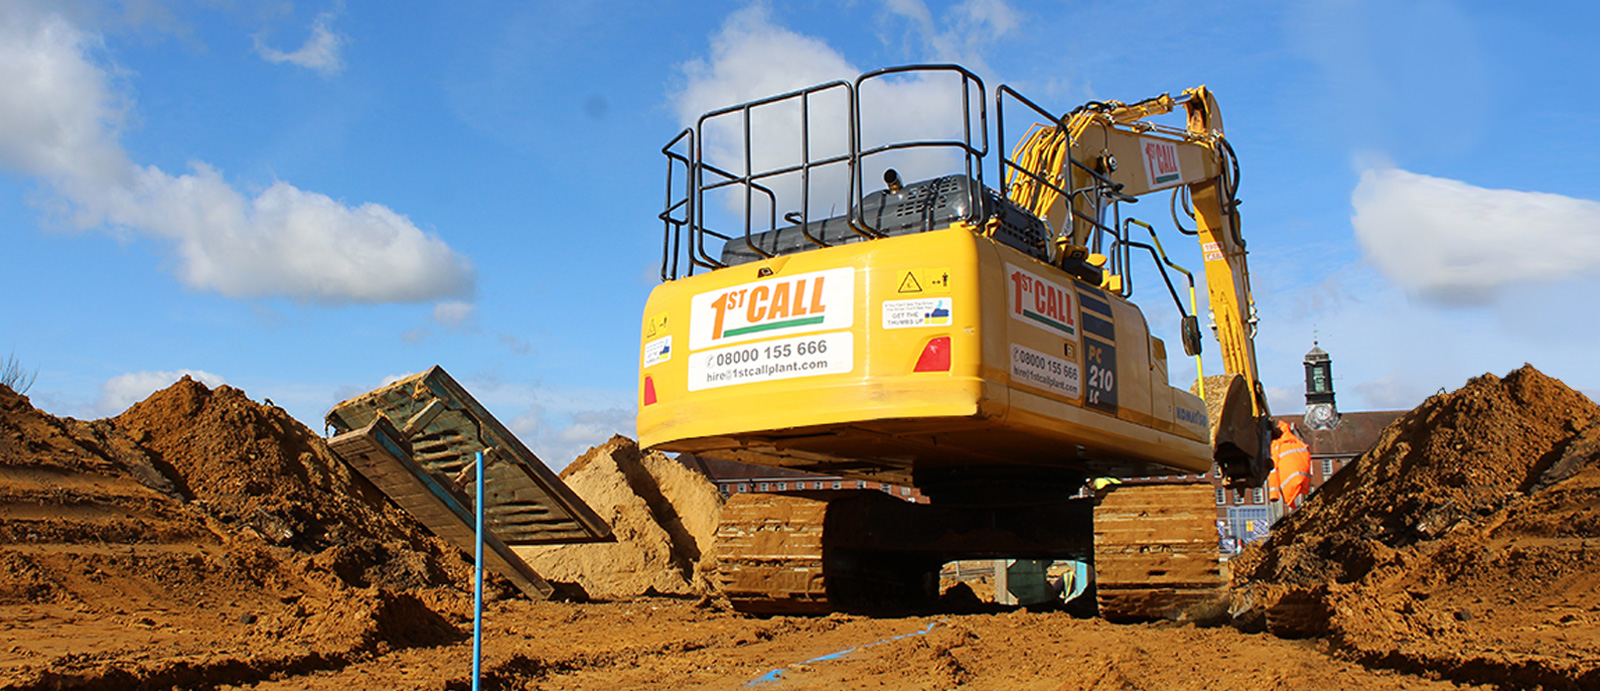 1st_Call_Plant_Excavator